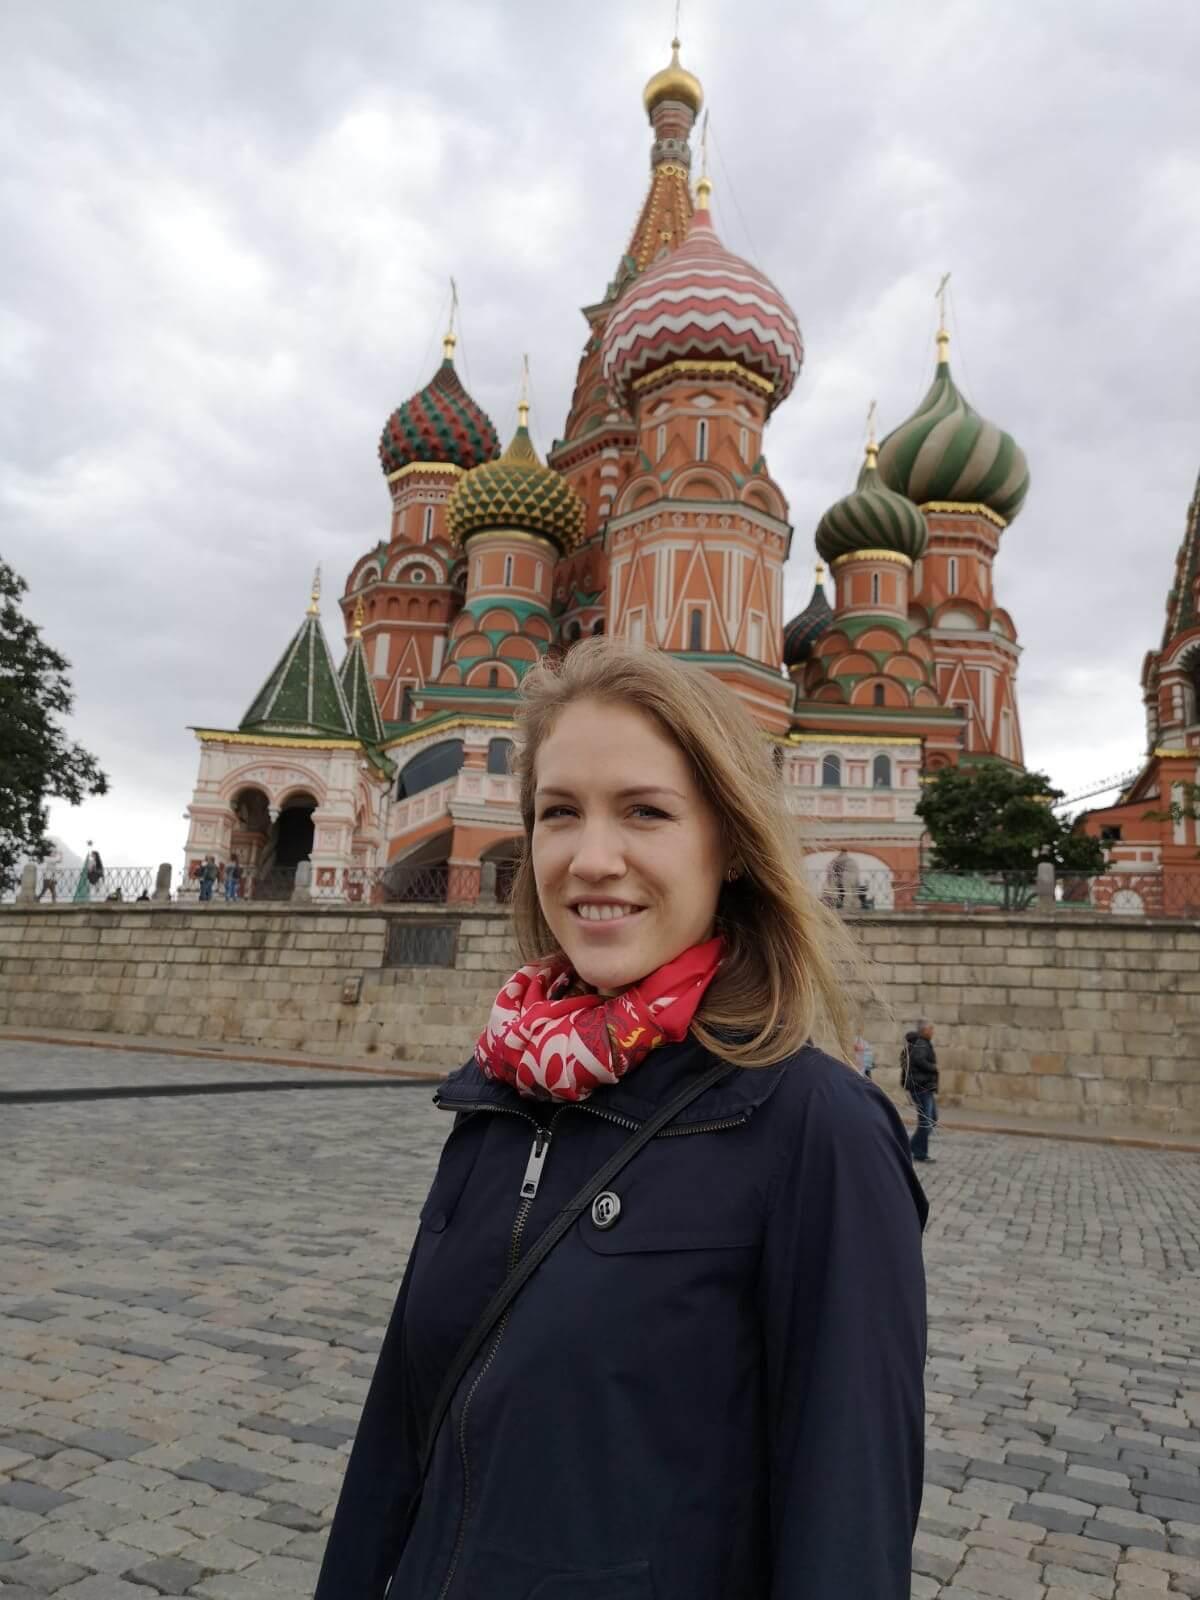 Kseniia saw how an MBA can impact your career